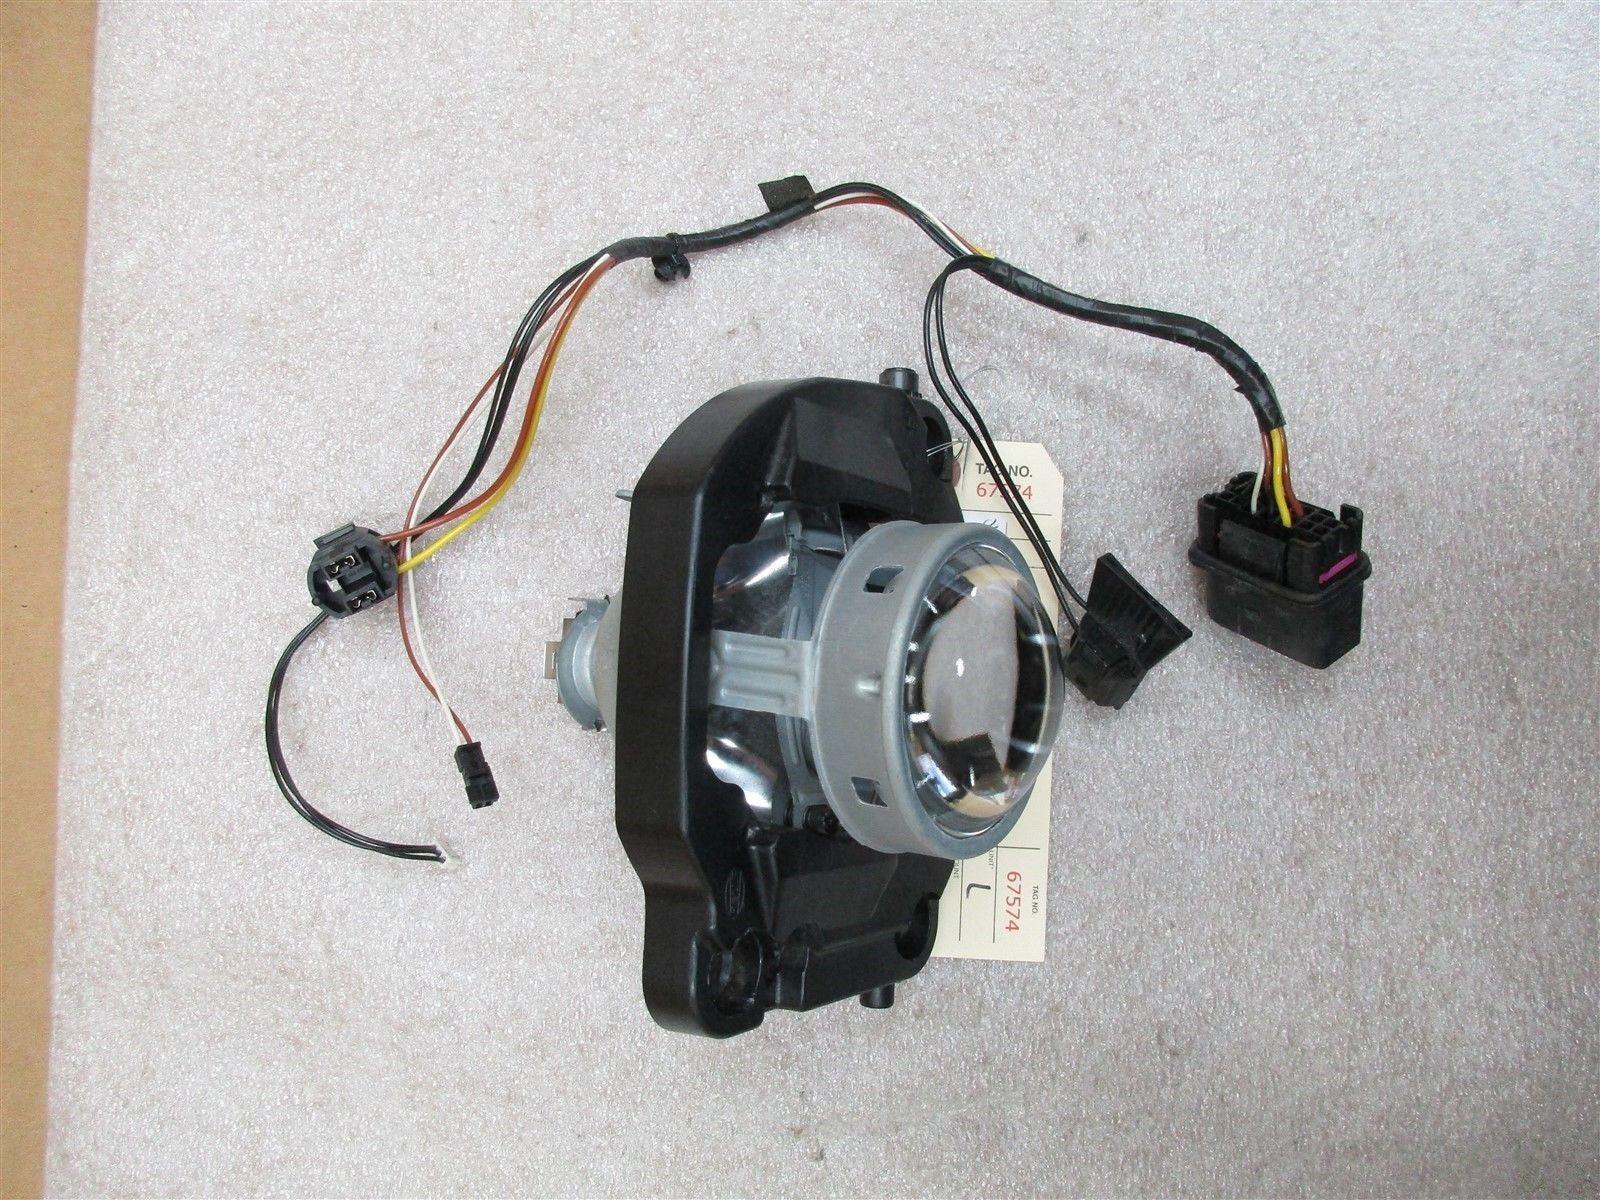 cayenne awd porsche 957 l headlight hardware wiring harness 122 parts  society